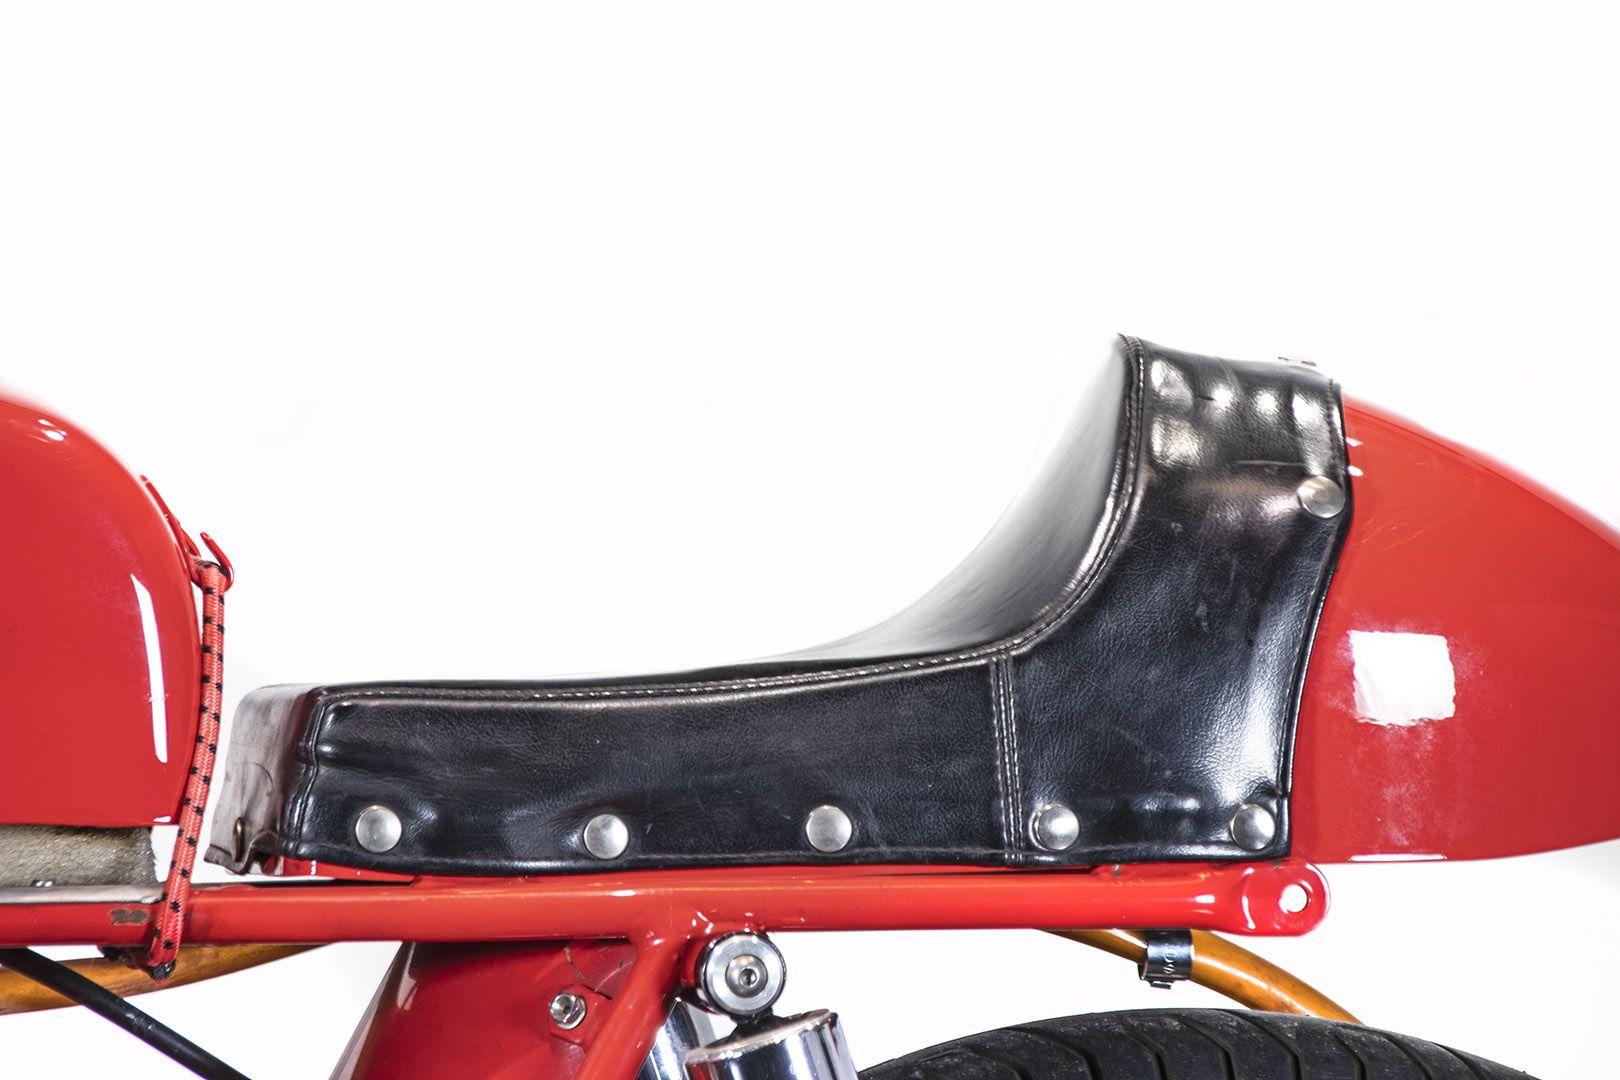 1969 Aermacchi Harley-Davidson 350 Ala d'oro 61122